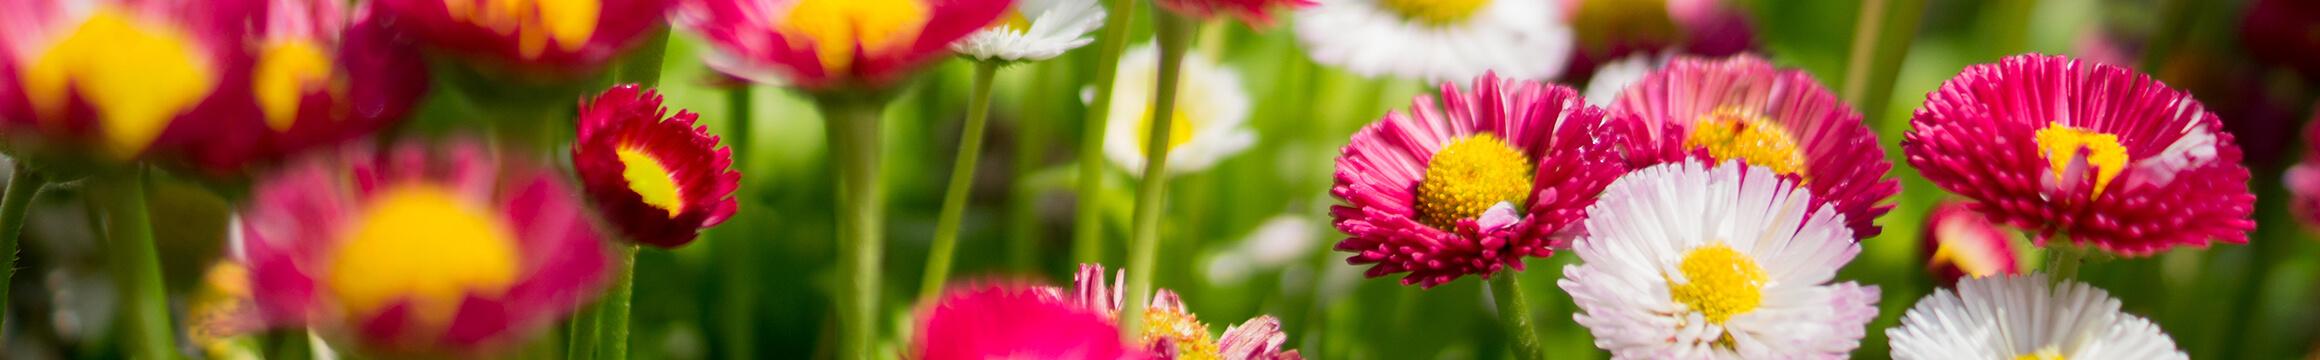 Floral 06